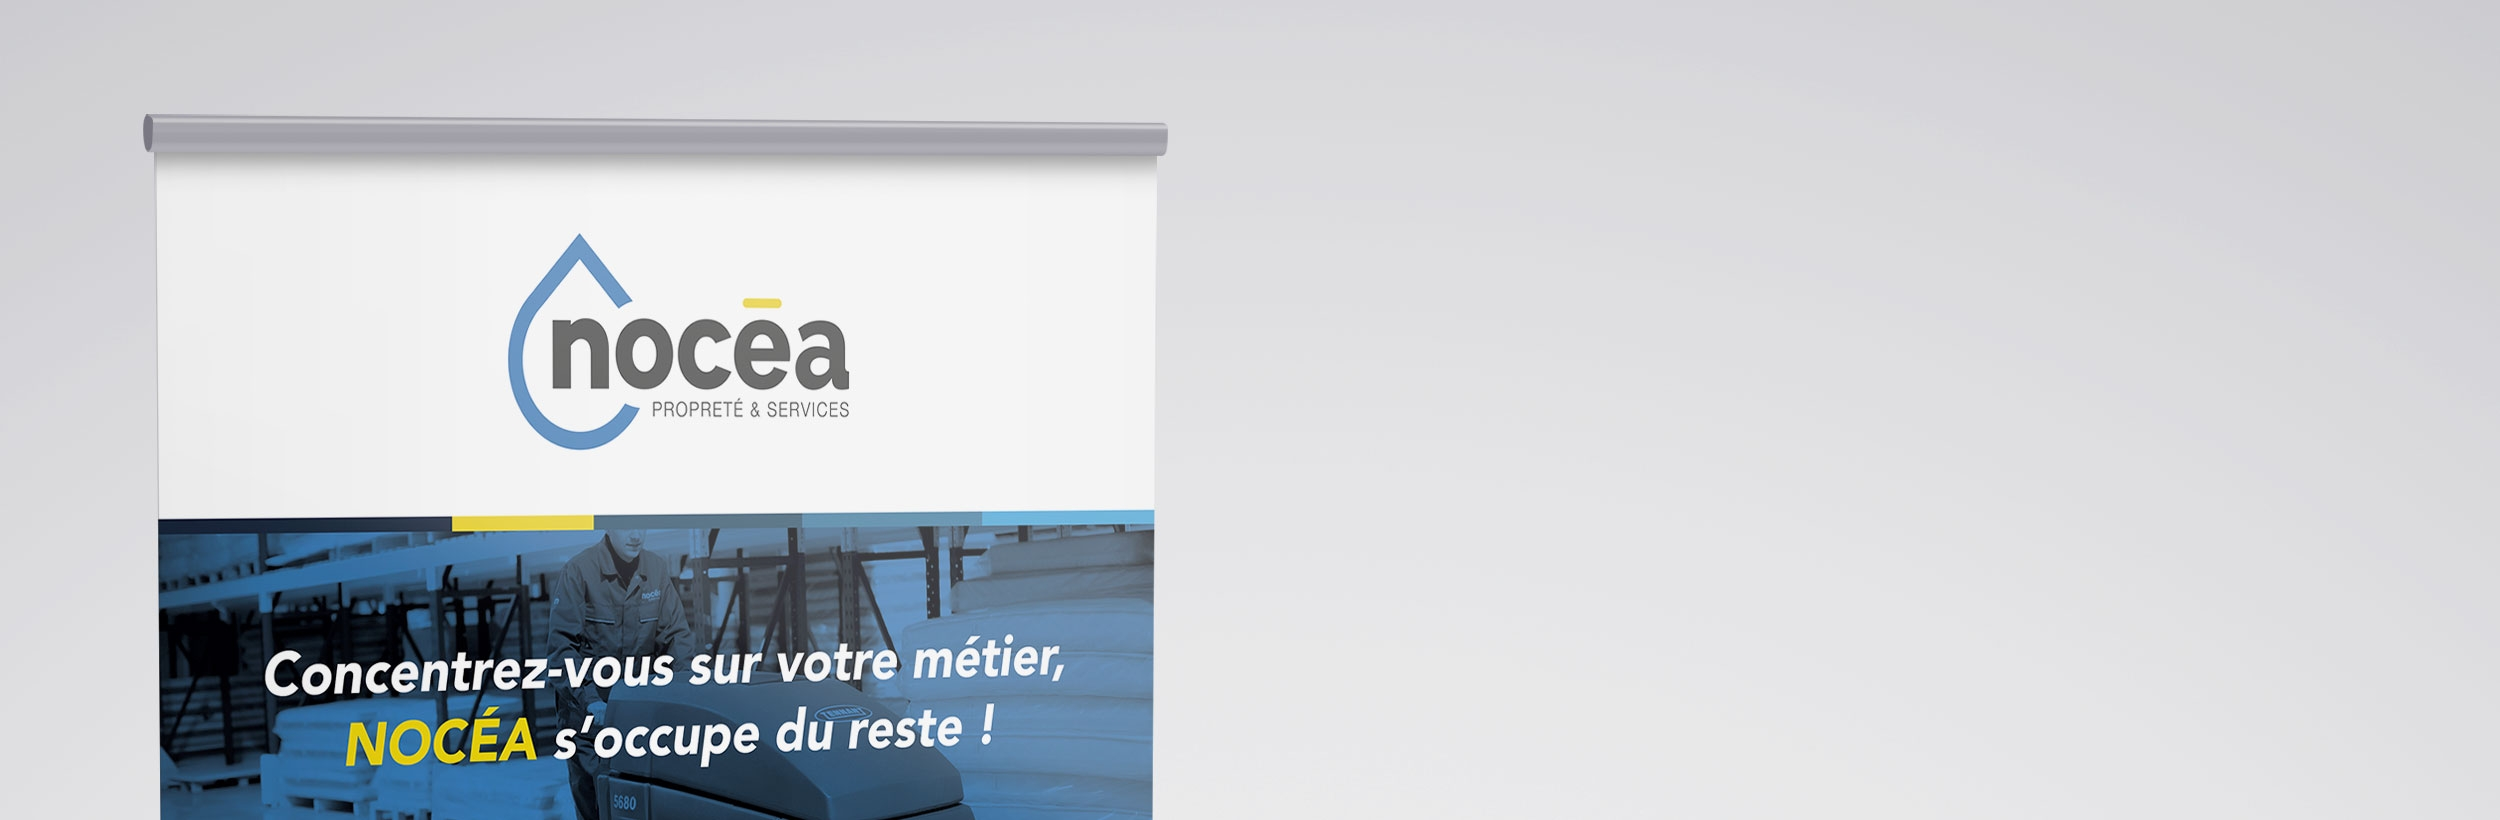 professionnels-print-supports-com-kakemono-nocea-pagetop